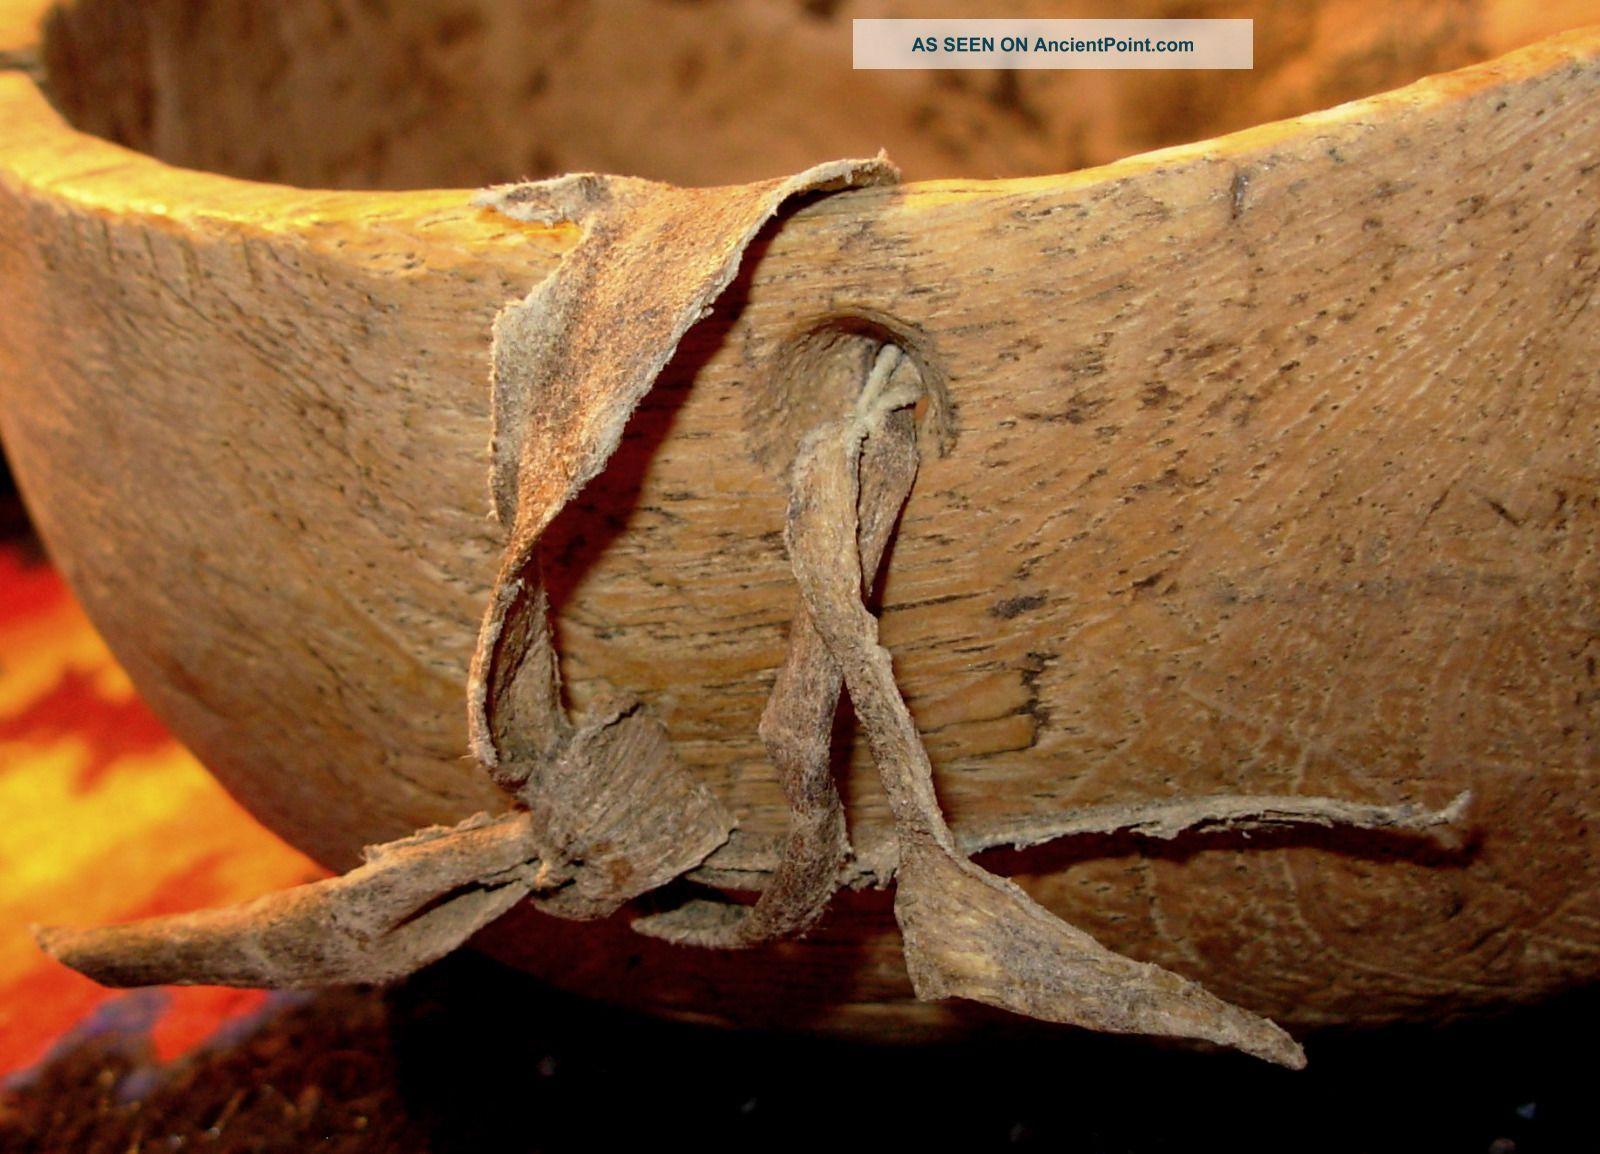 Rare Native American Hand Carved Wood Bowl/rawhide Strap/primitive/apache? Native American photo